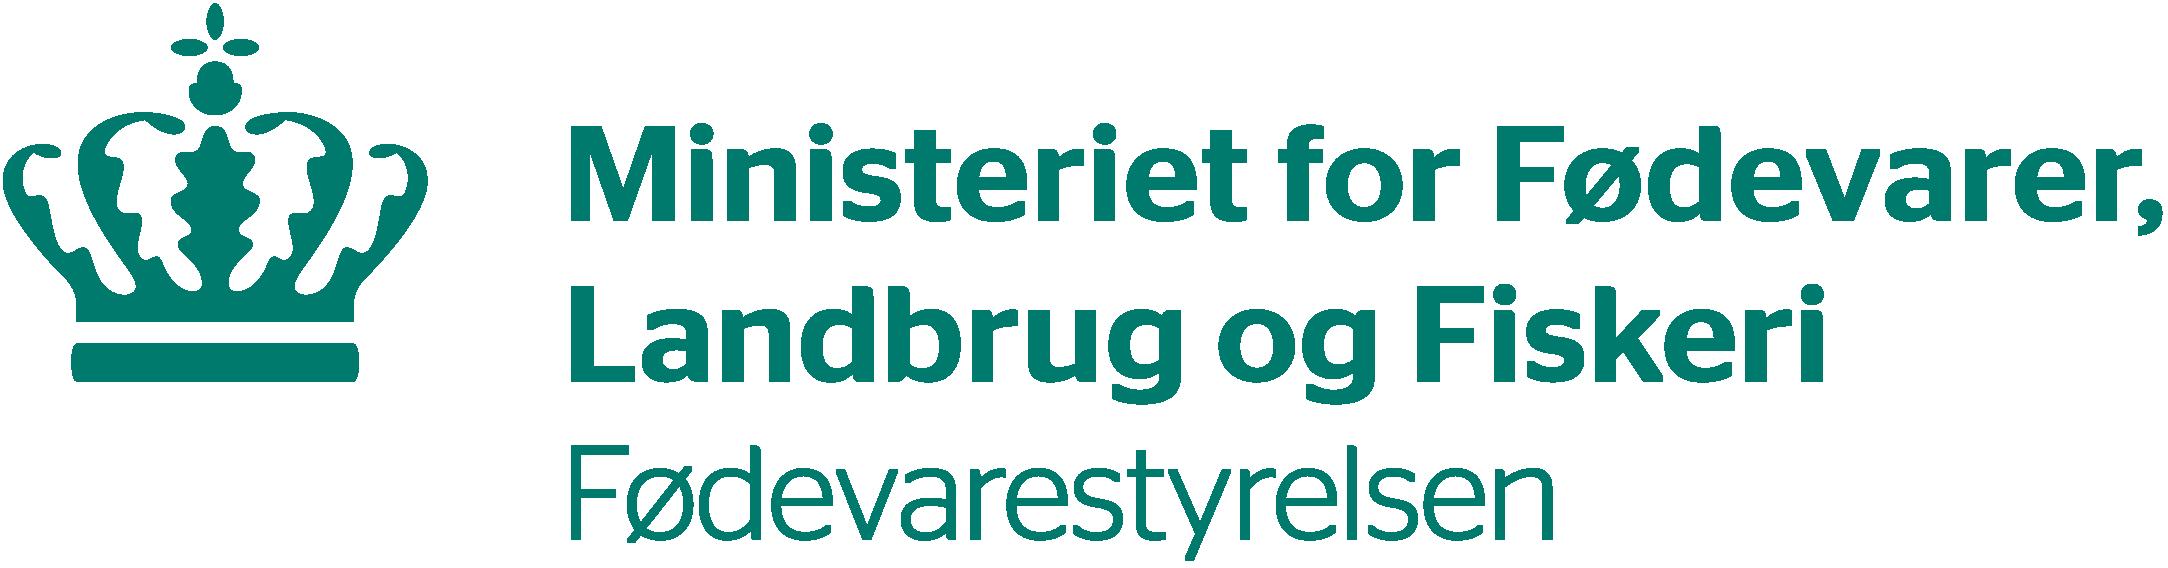 Fødevarestyrelsen logo